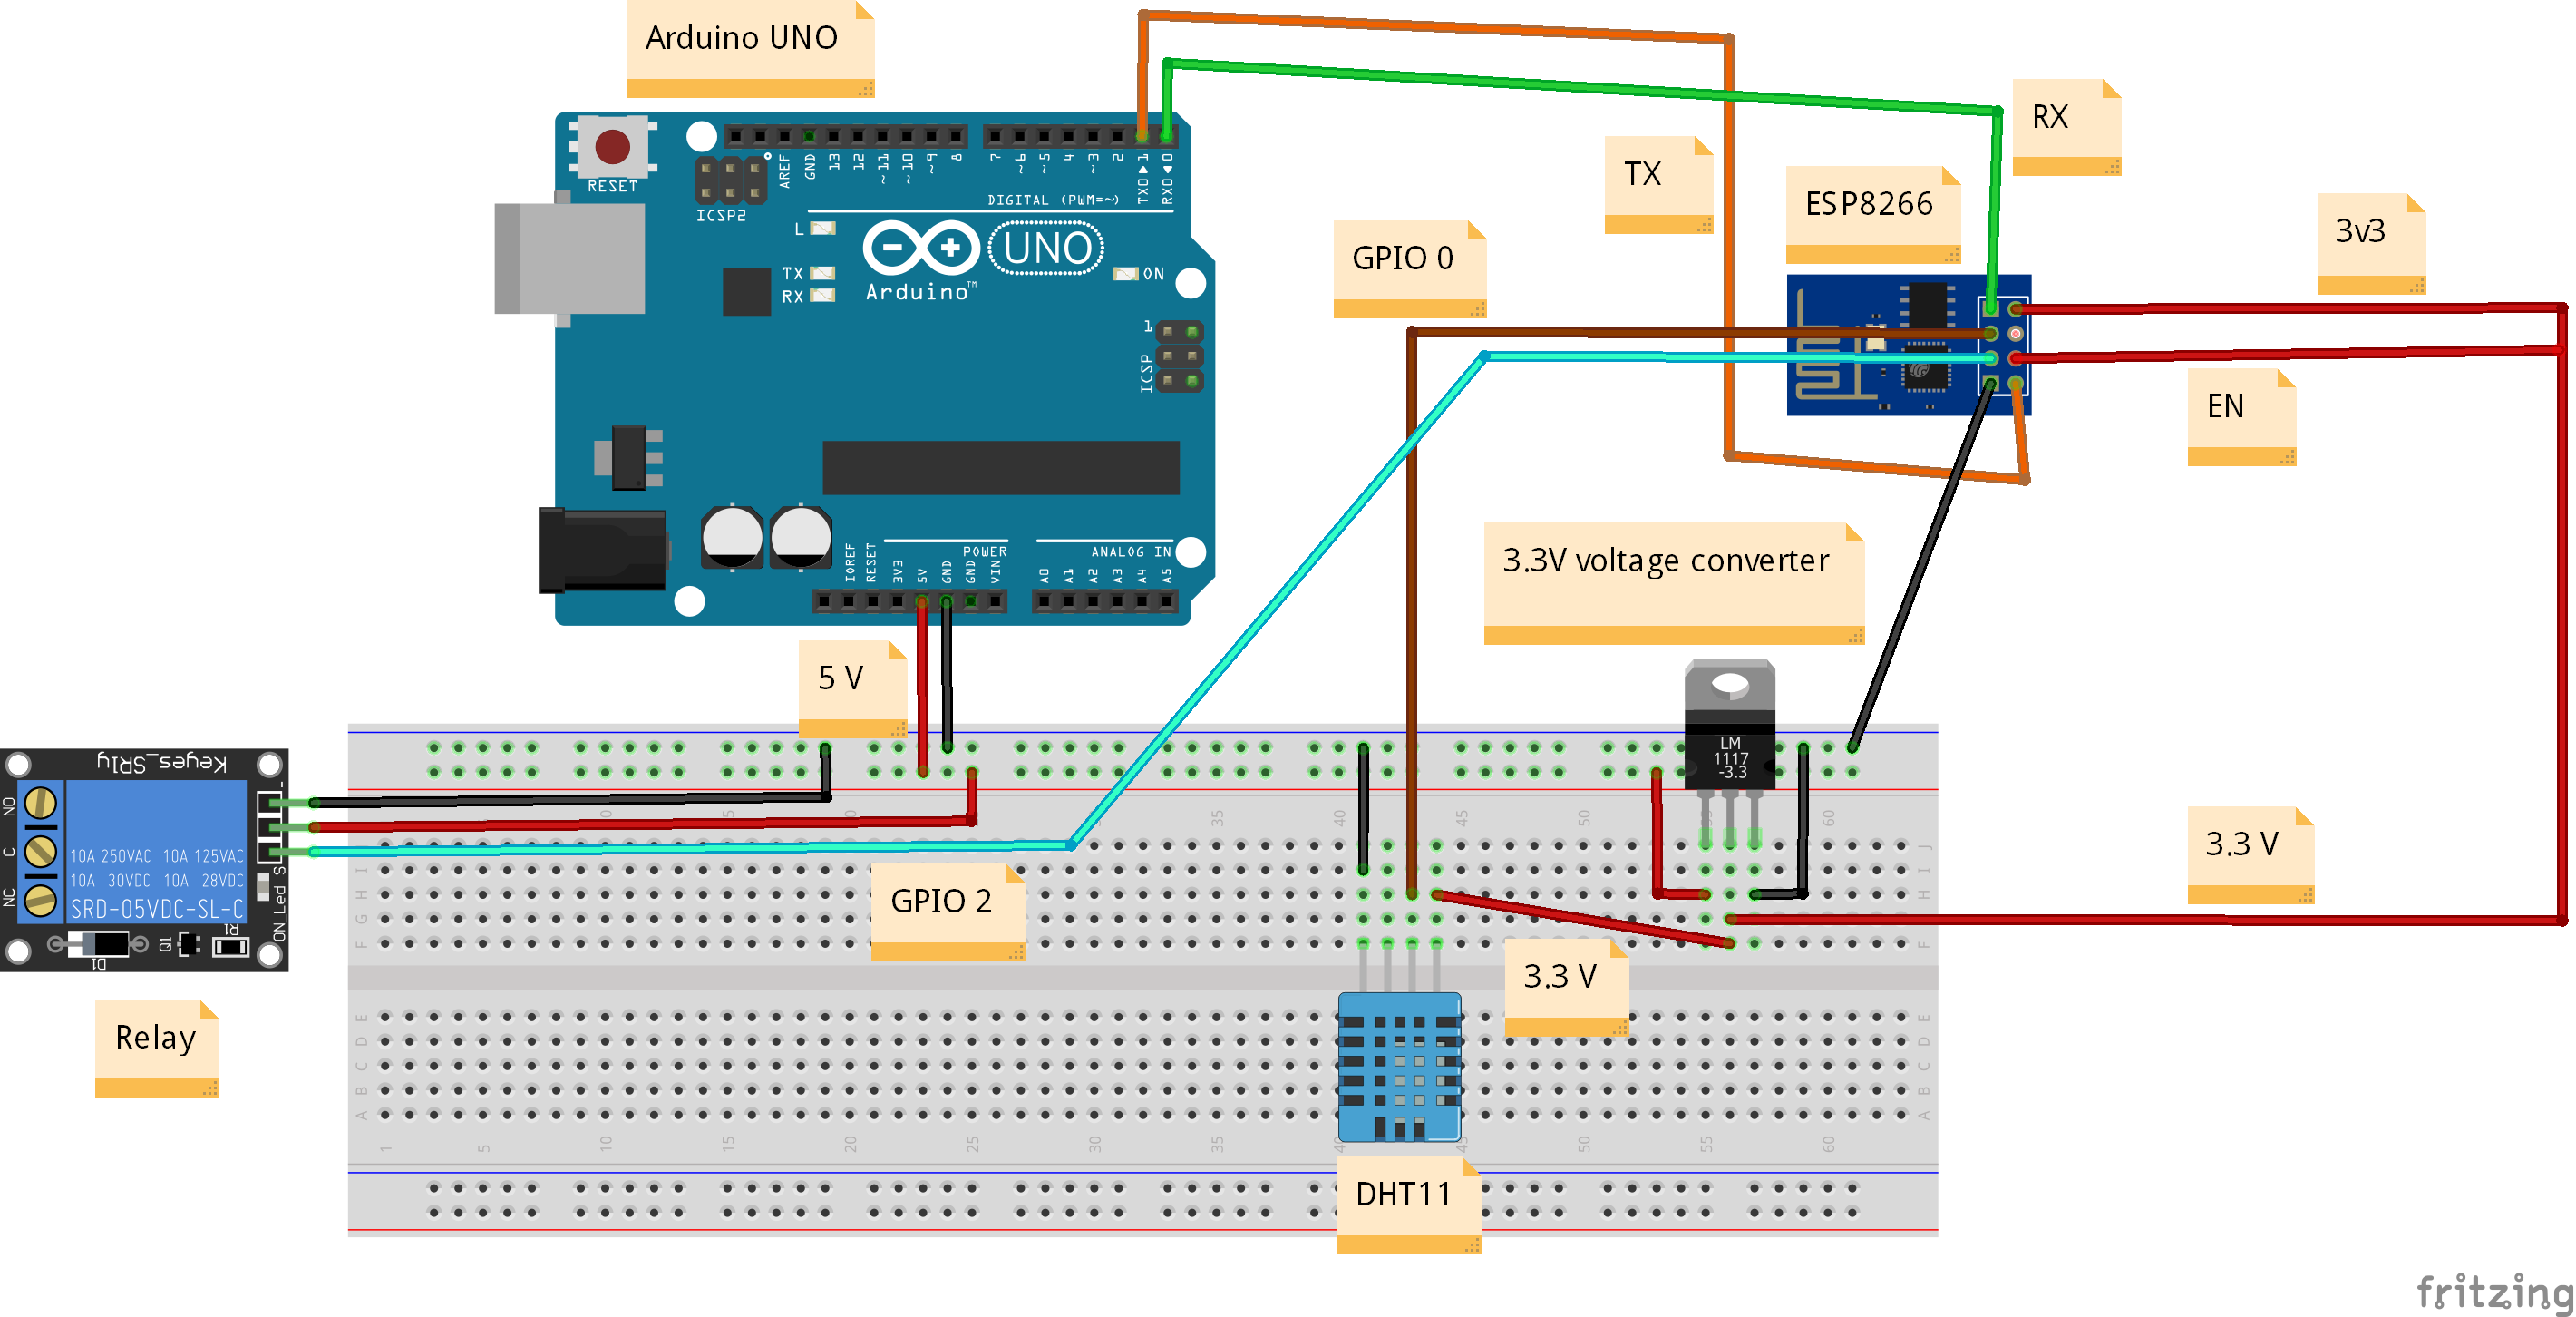 Arduino alexa ynlluz2d54